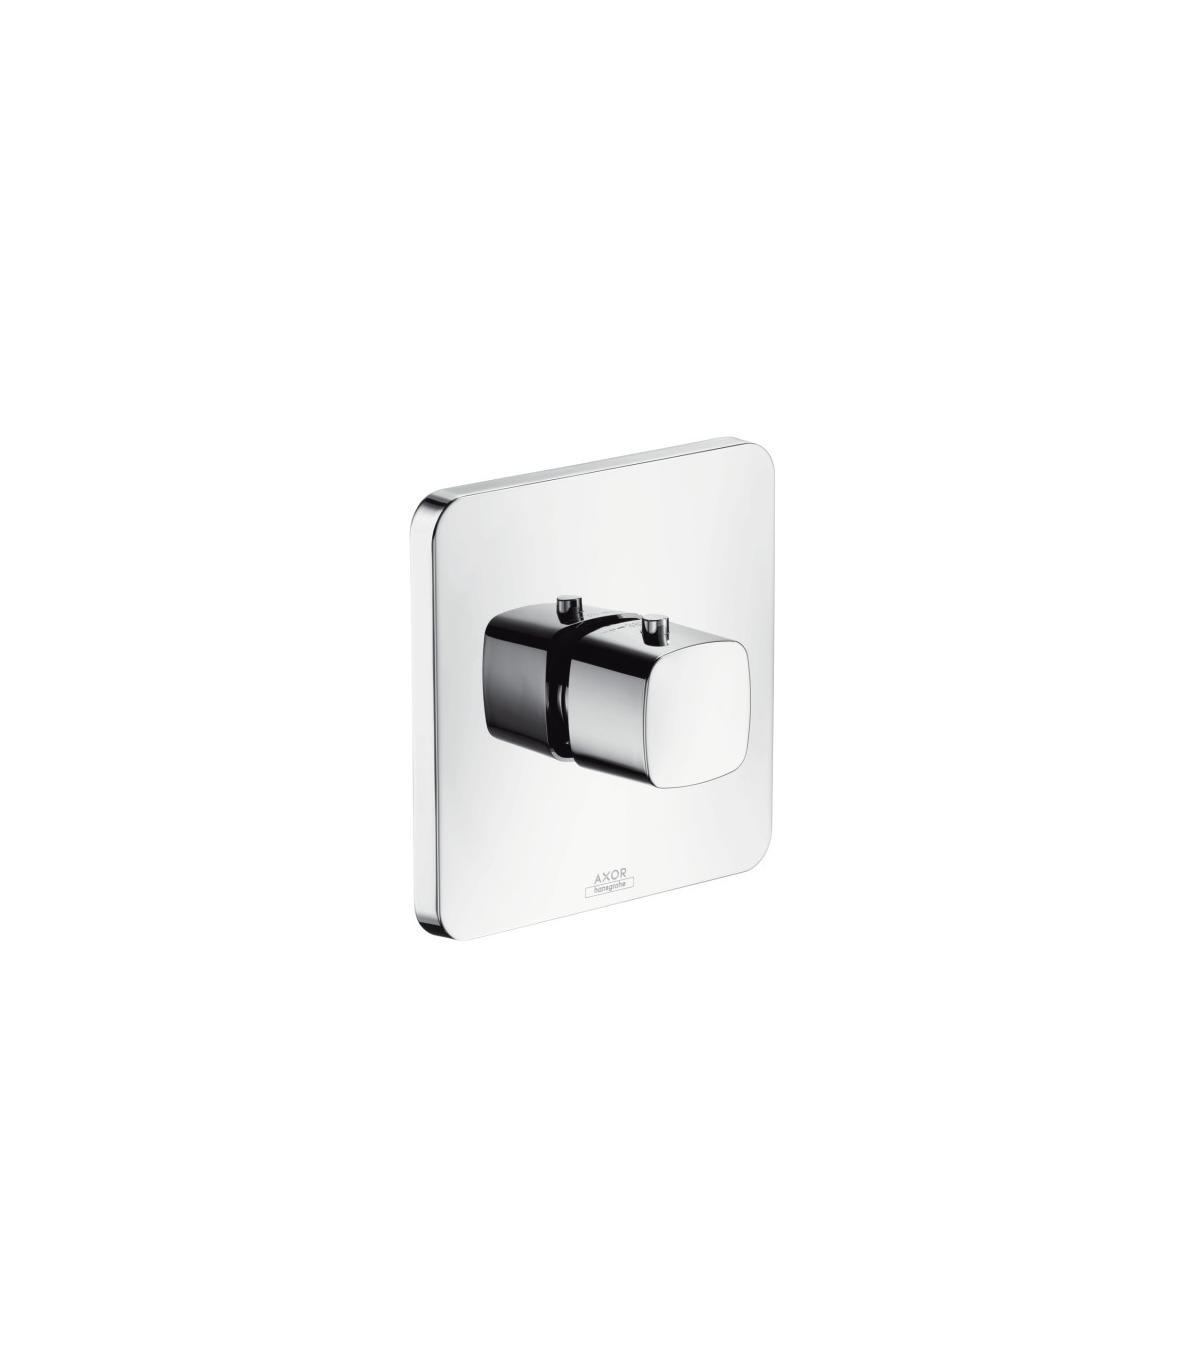 Ceramica Dolomite Schede Tecniche.Bidet A Pavimento Btw Ceramica Dolomite Serie Gemma 2 J523501